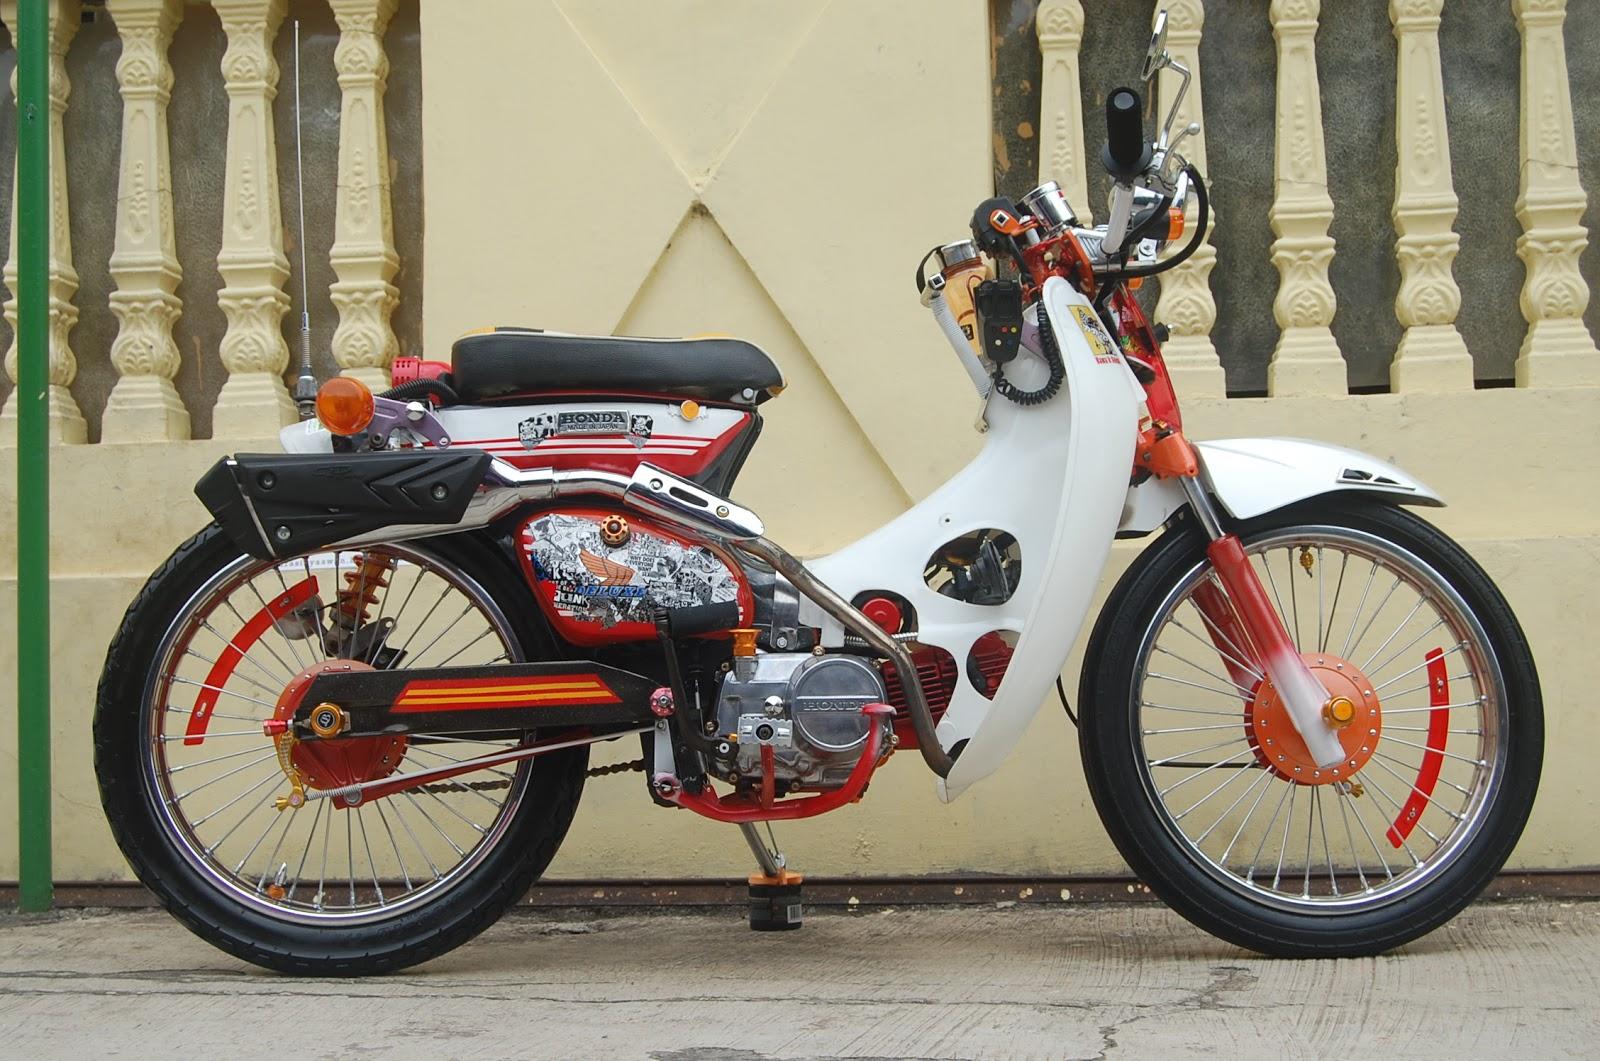 88 Modifikasi Motor Astrea 800 Sederhana Terupdate Gendoel Motoer